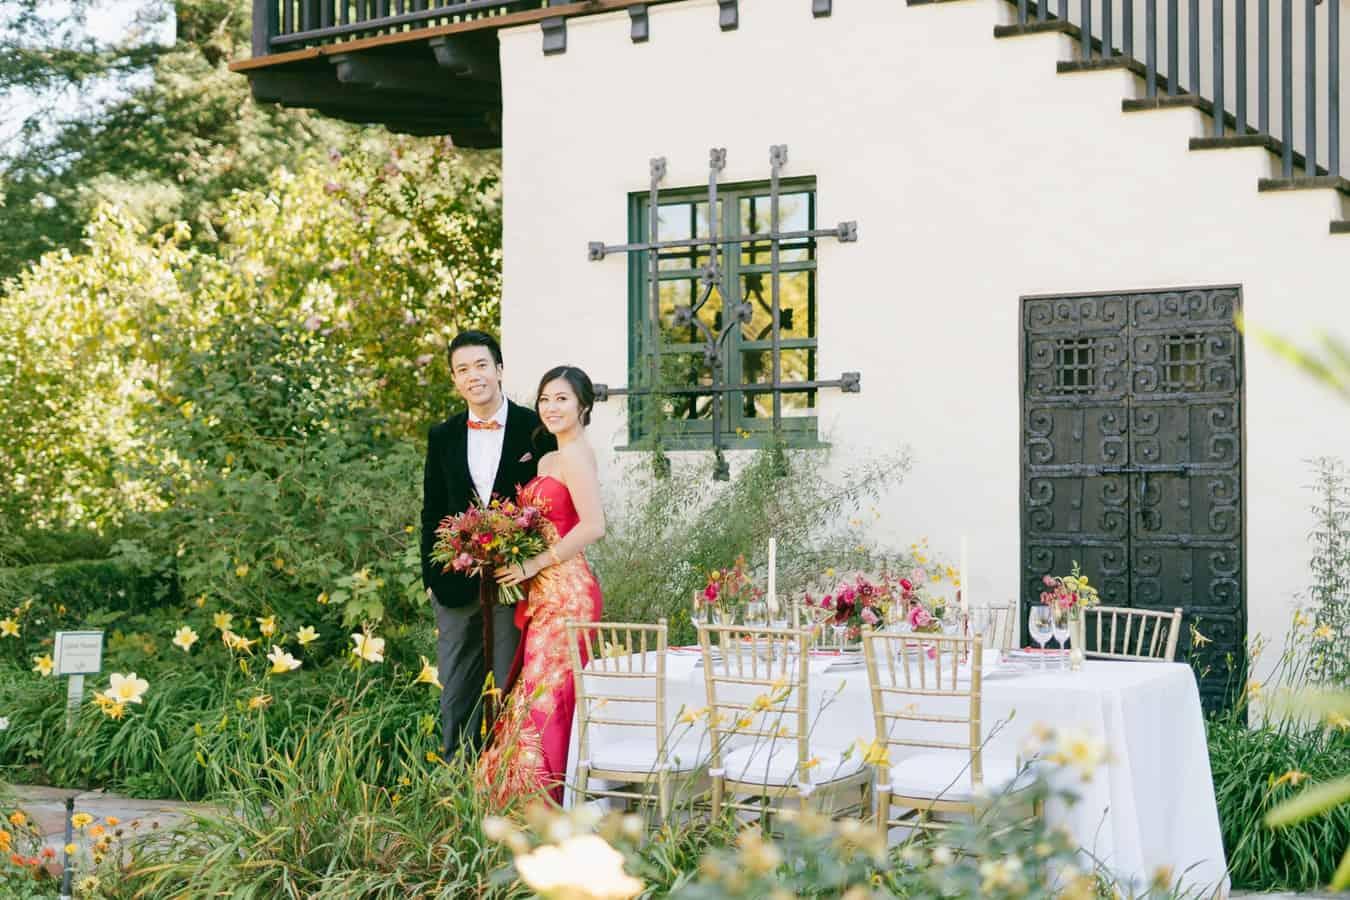 Chinese Wedding Ceremonies